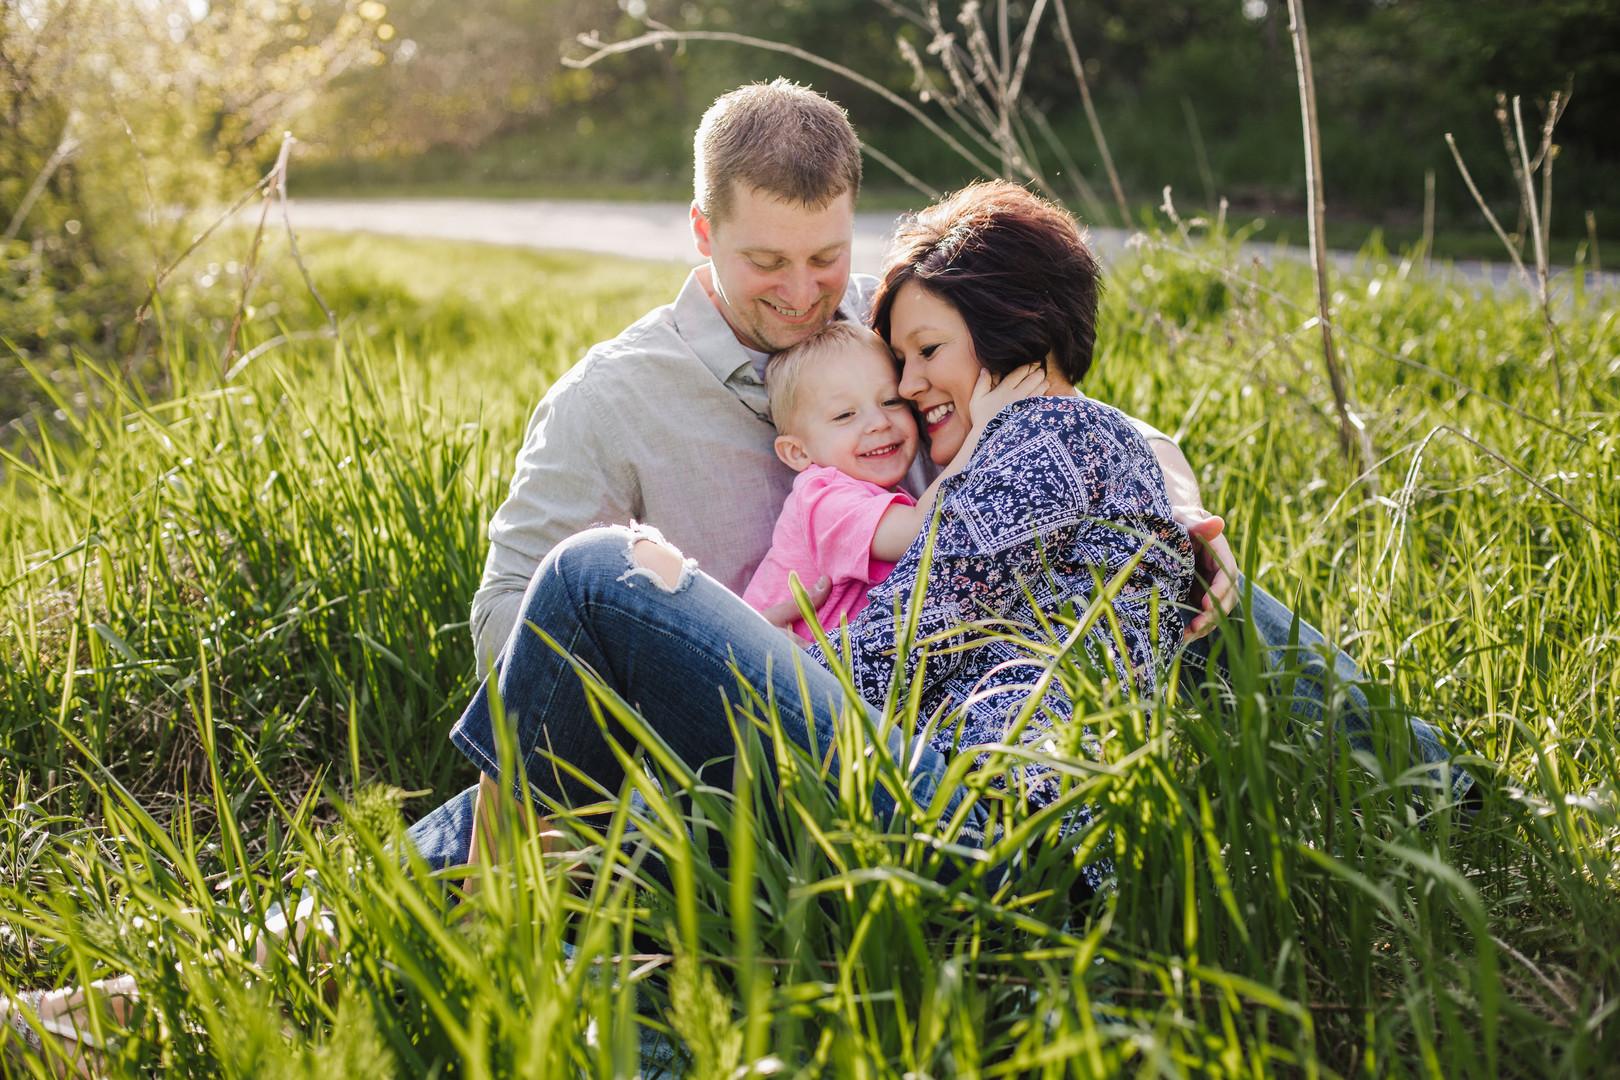 TRUE IMAGERY SHELBY FAMILY PHOTOGRAPHER